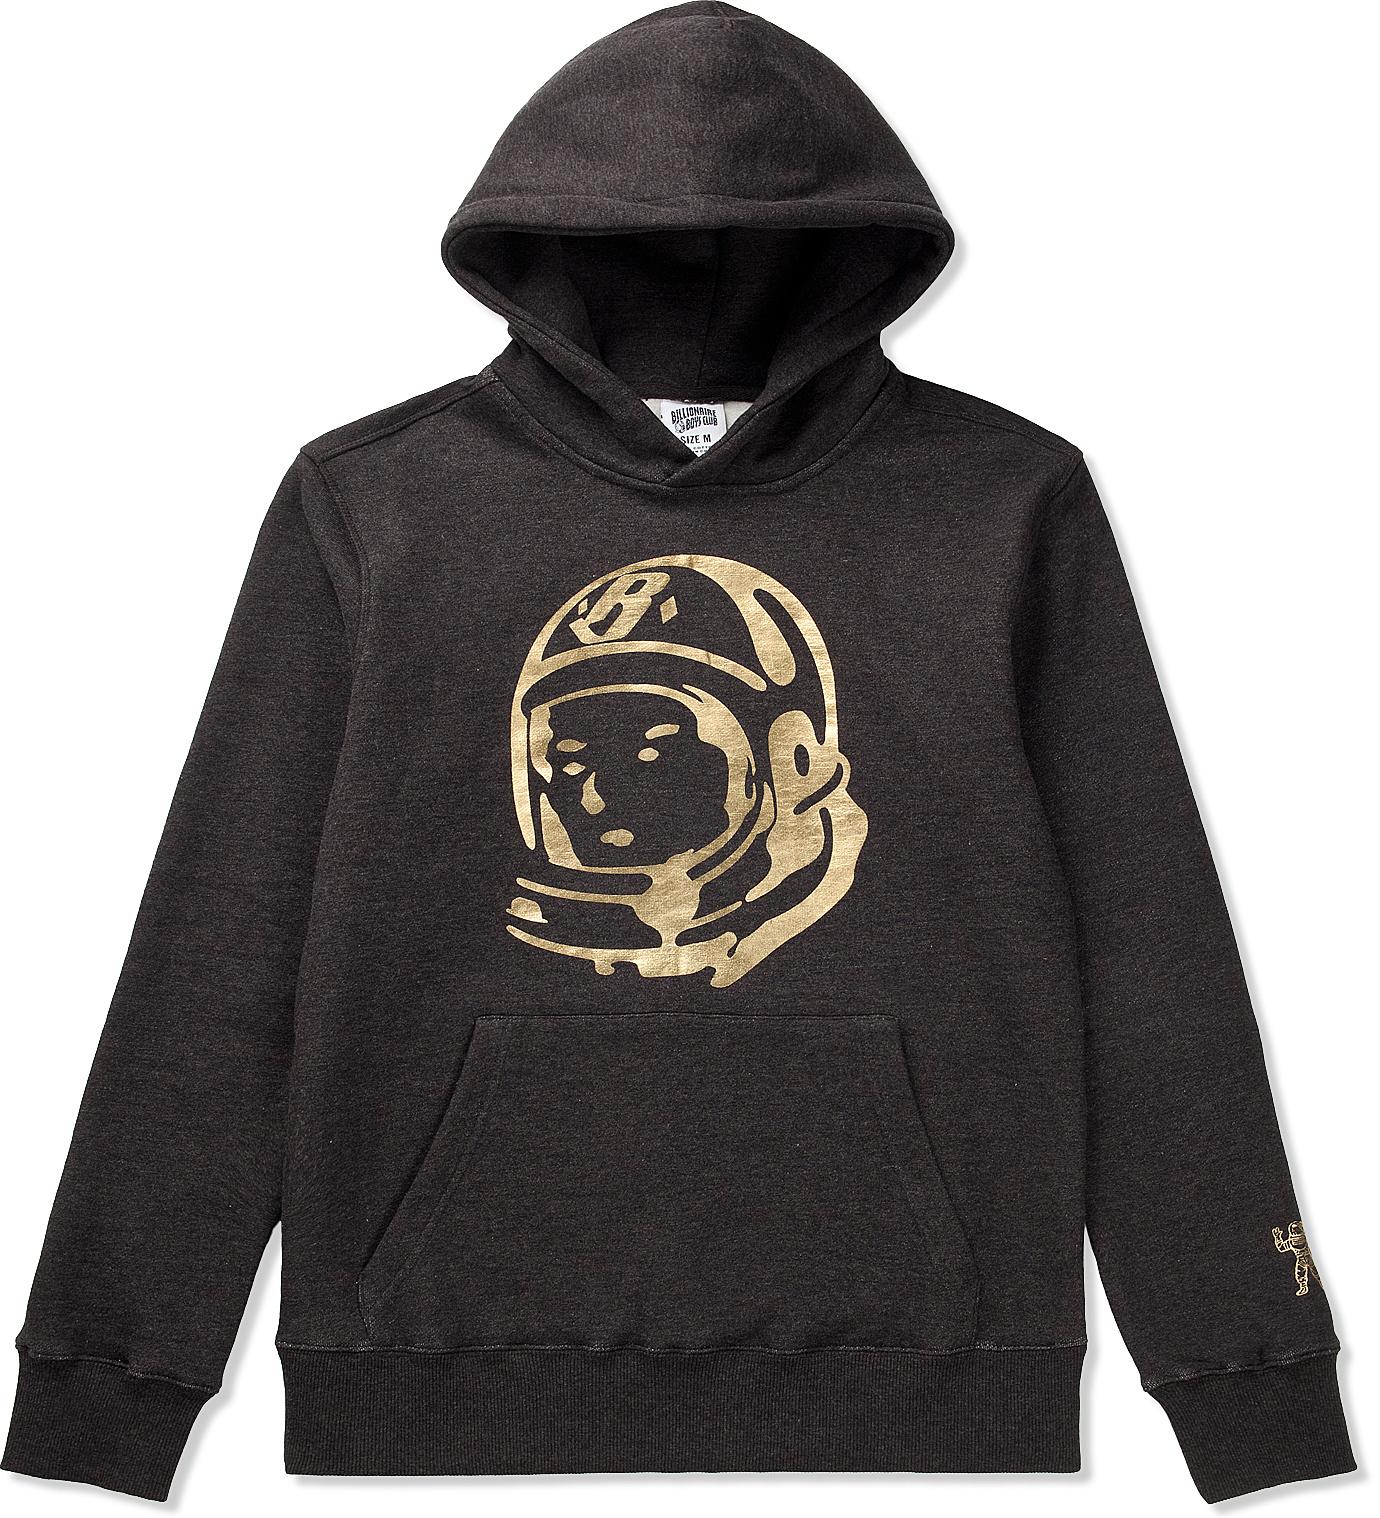 Billionaire boys club pullover hoodie